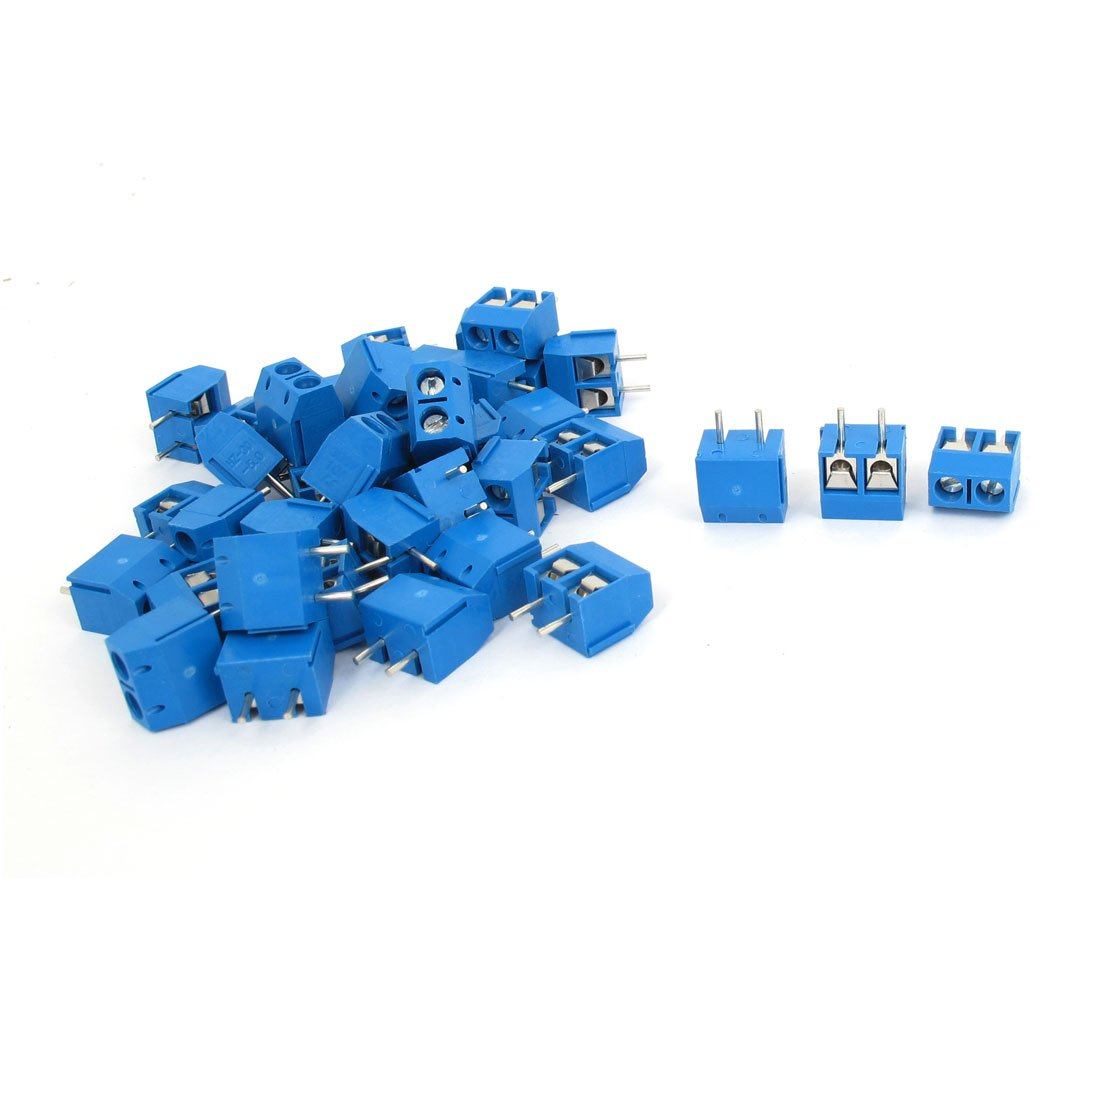 uxcell AC 300V 10A 2 Pin 5mm Pitch PCB Mount Screw Terminal Block 40 Pcs Blue